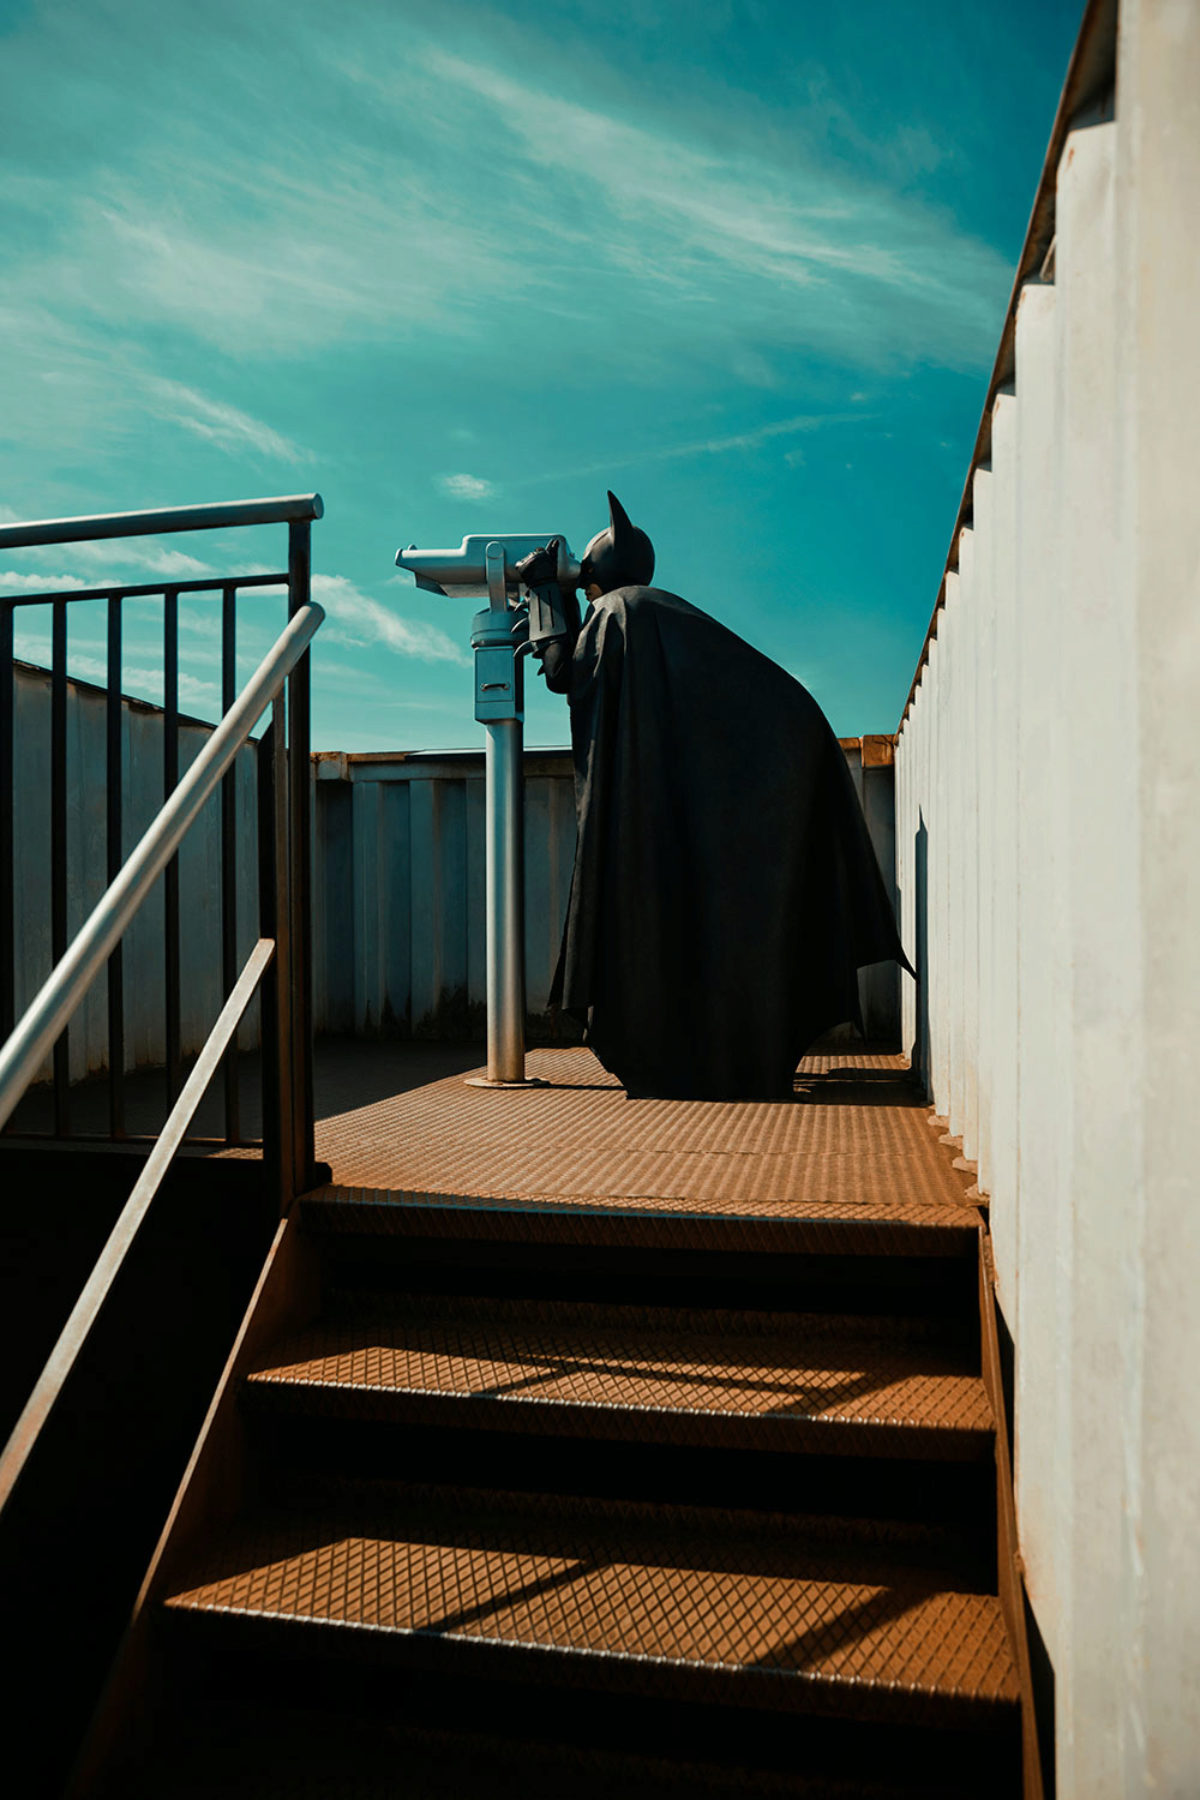 Batman looking through sightseeing binoculars